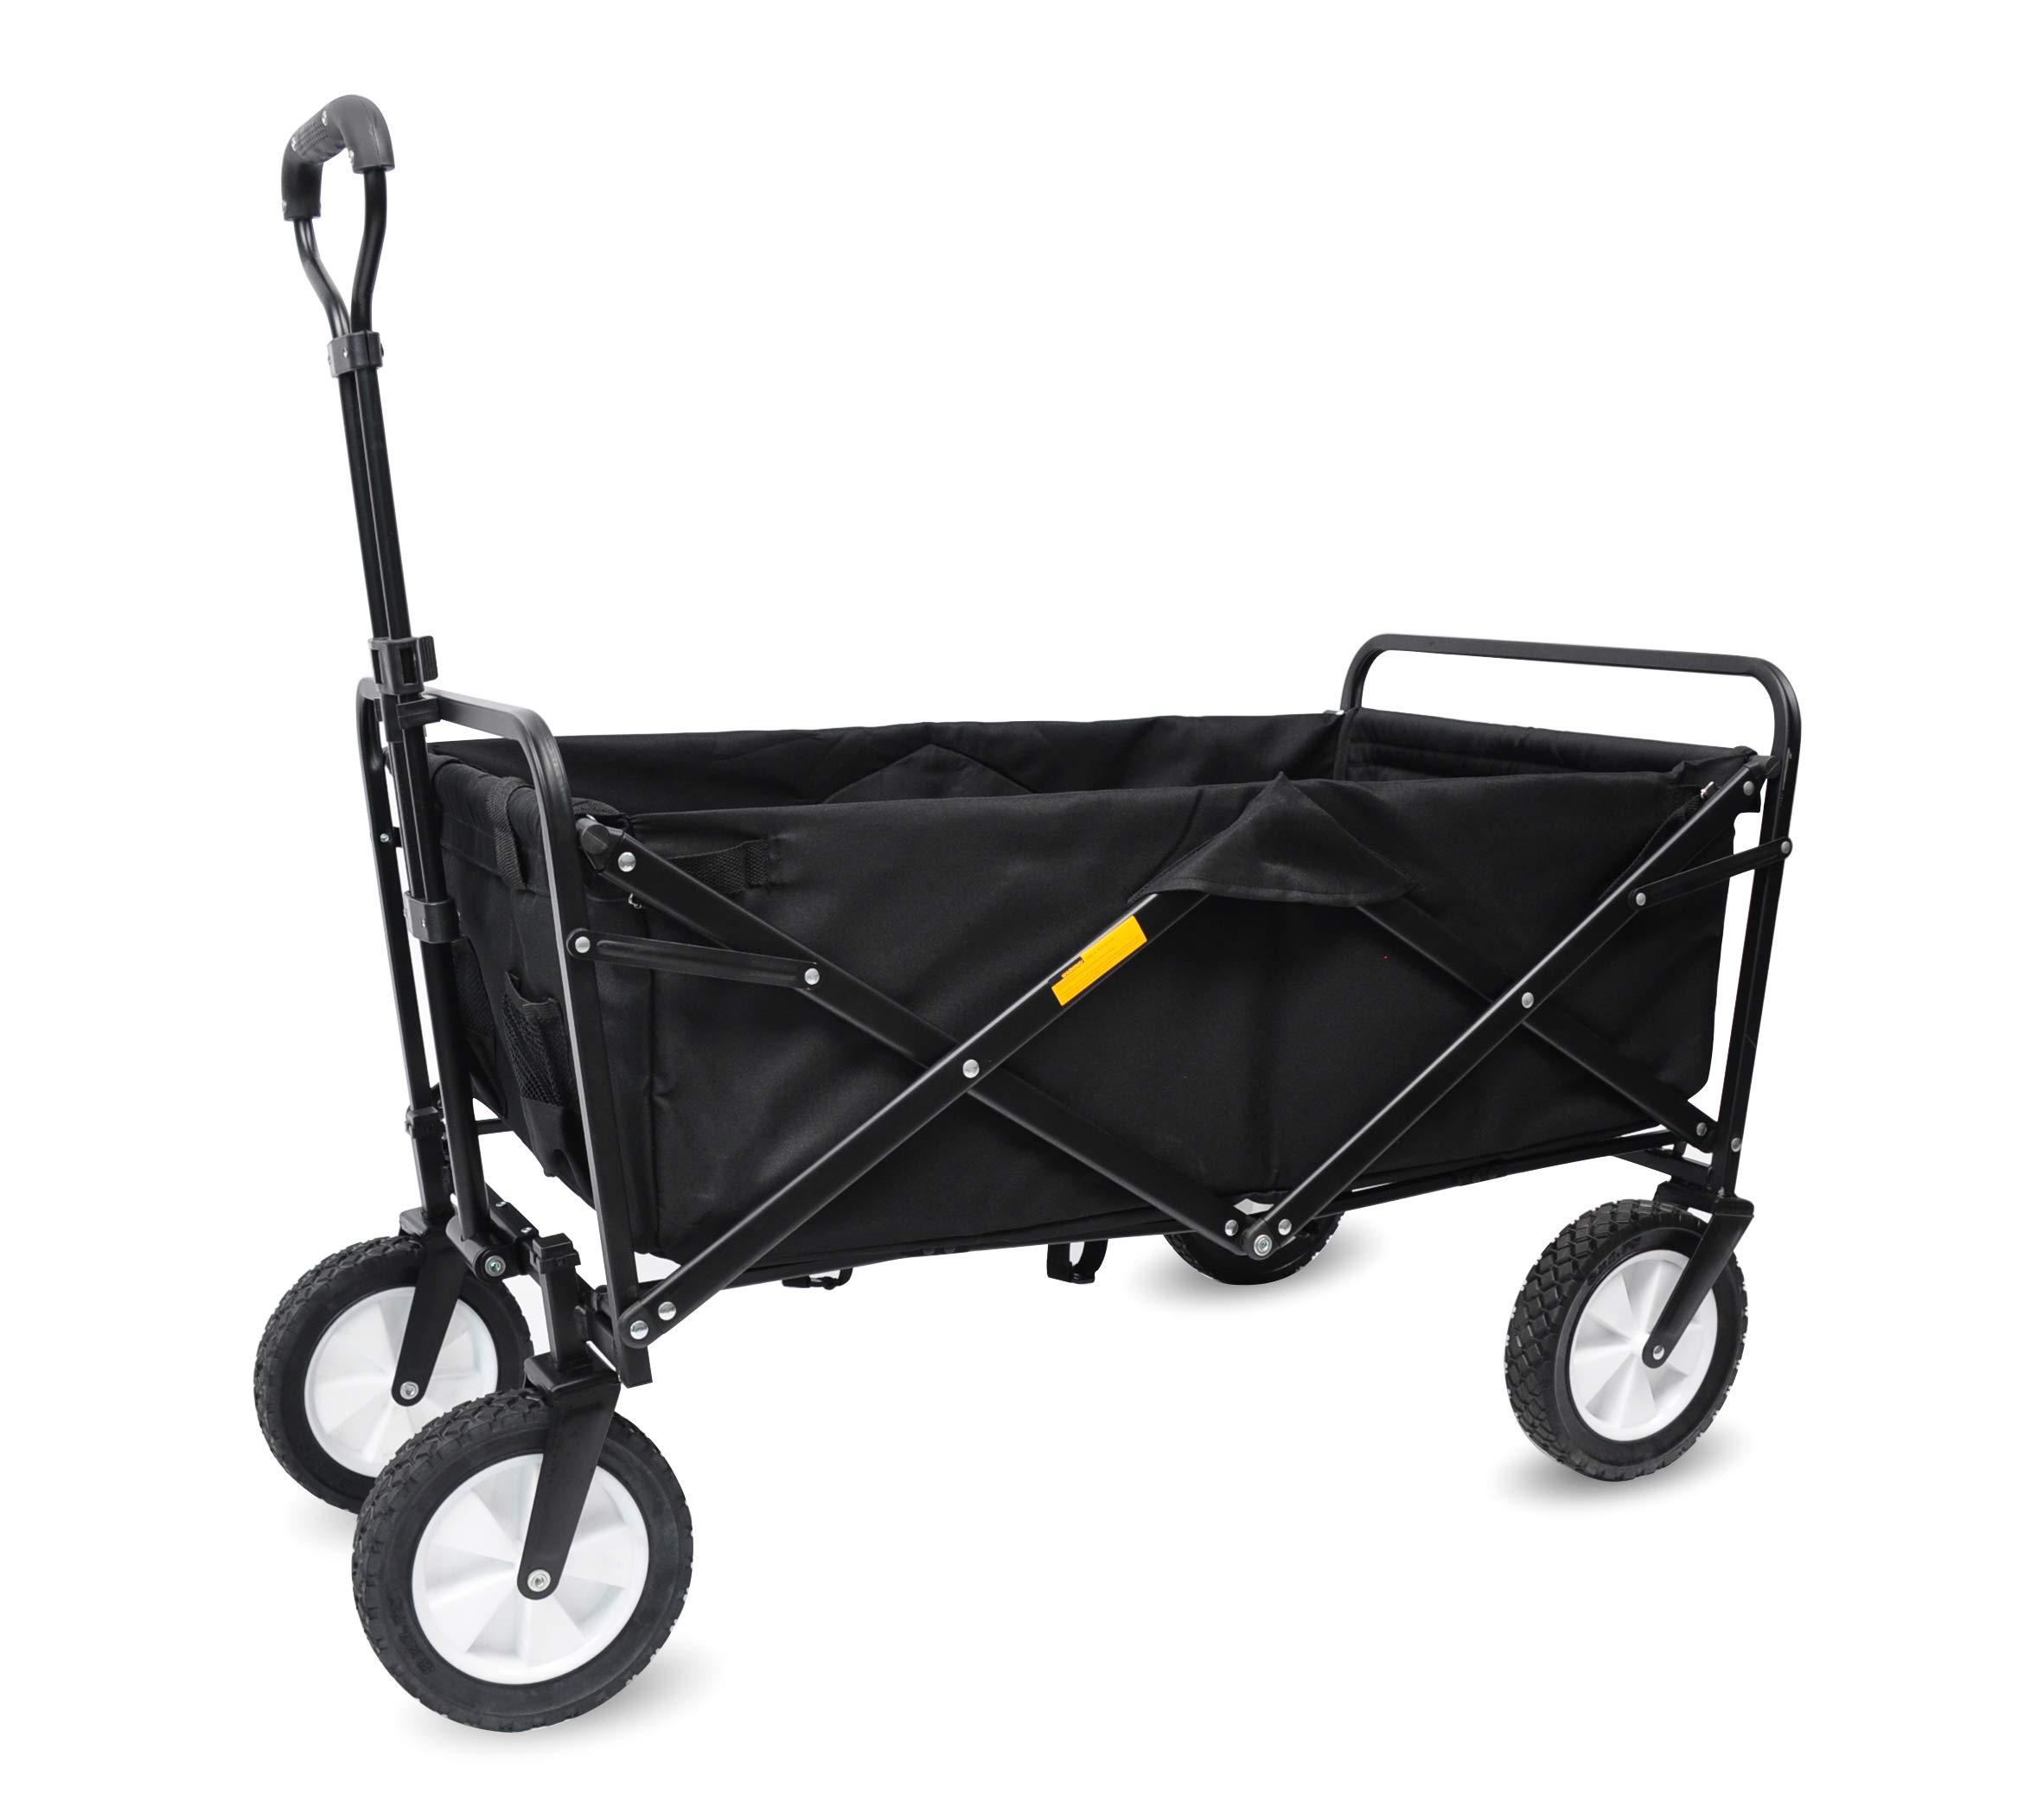 WHITSUNDAY Collapsible Folding Garden Outdoor Park Utility 30'' Picnic Wagon 1 Year Warranty (Black) by WHITSUNDAY